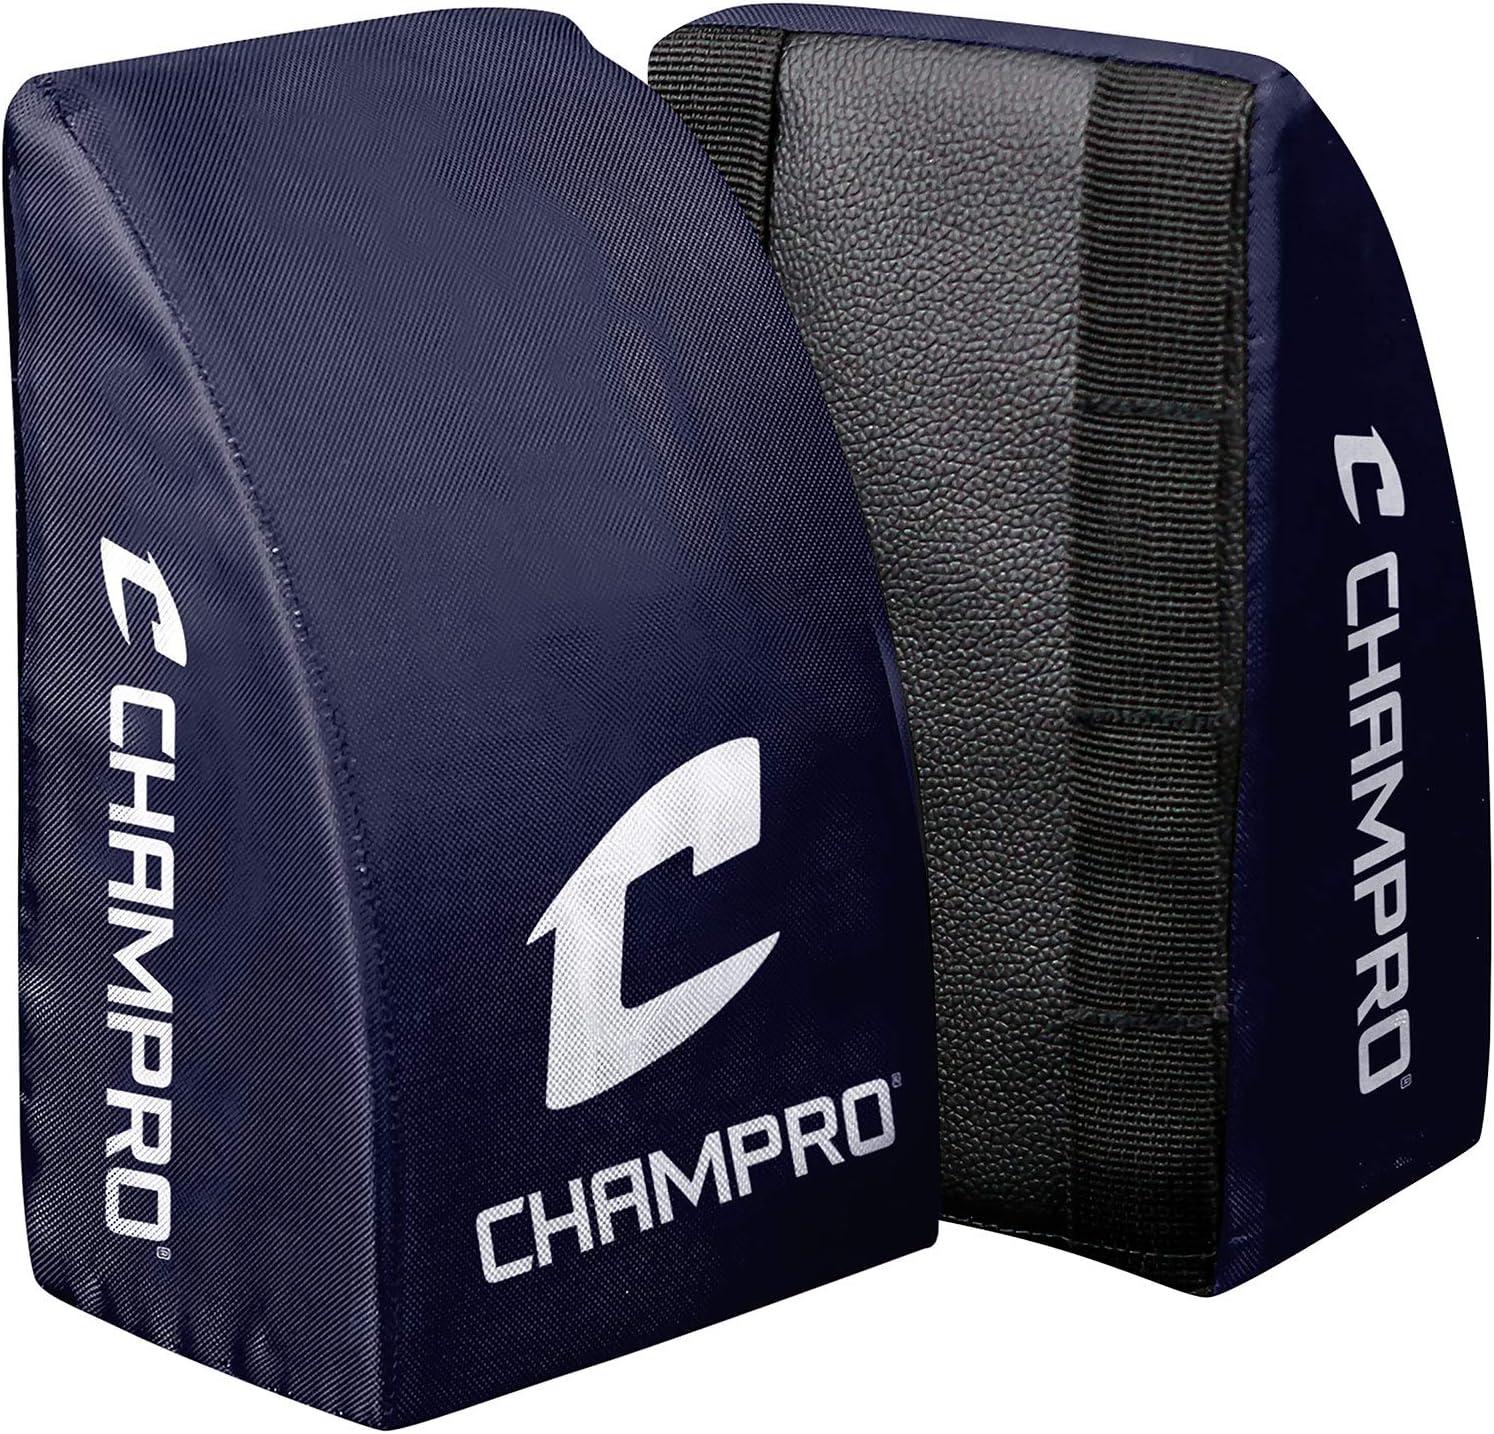 Champro Catchers Knee Support